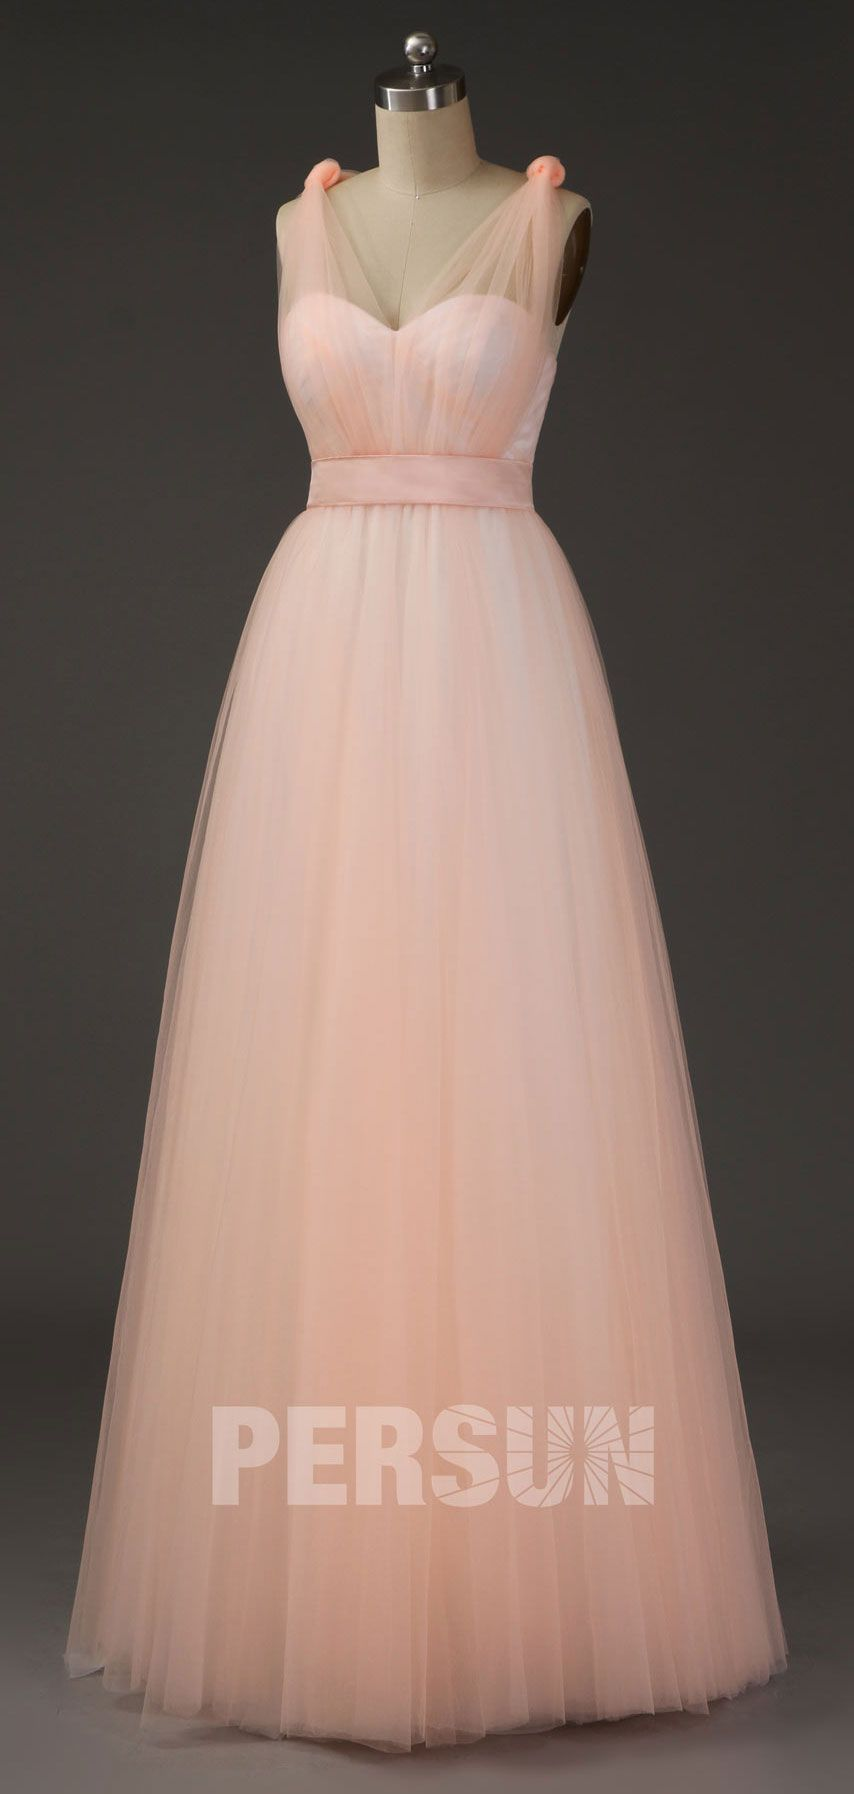 Robe Ceremonie Mariage Peche Clair Princesse En Tulle Avec Bretelle Convertible Robe Ceremonie Idees Vestimentaires Mariage Peche